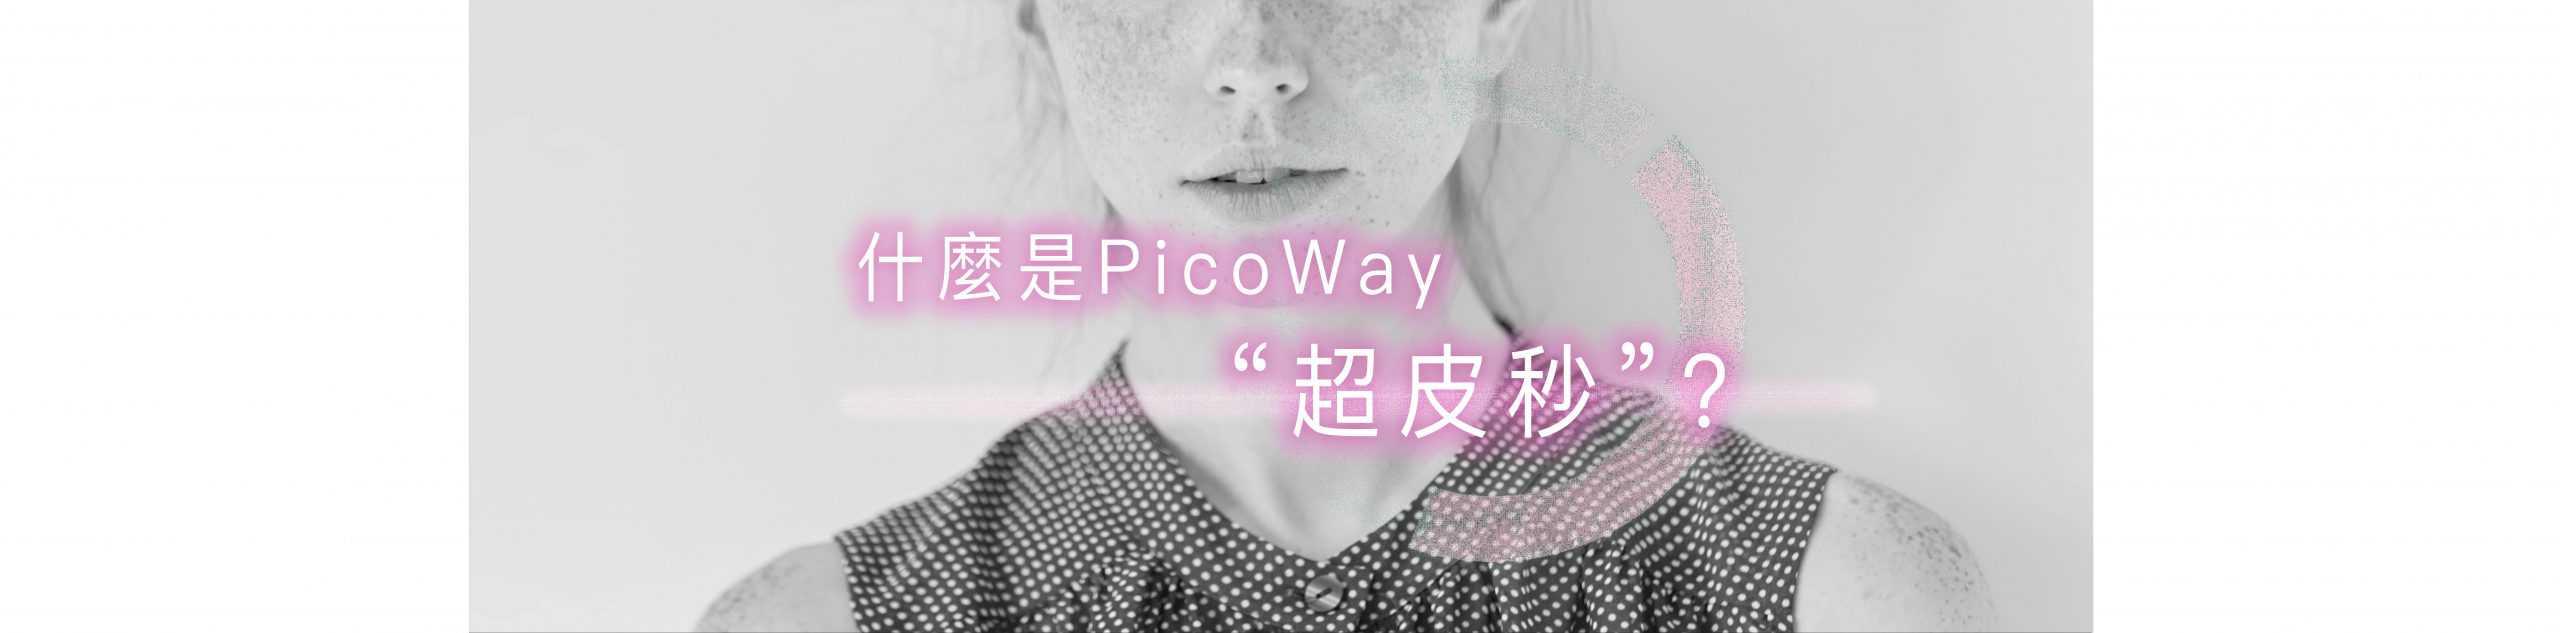 Picoway Picoway ptop3 06 2 scaled